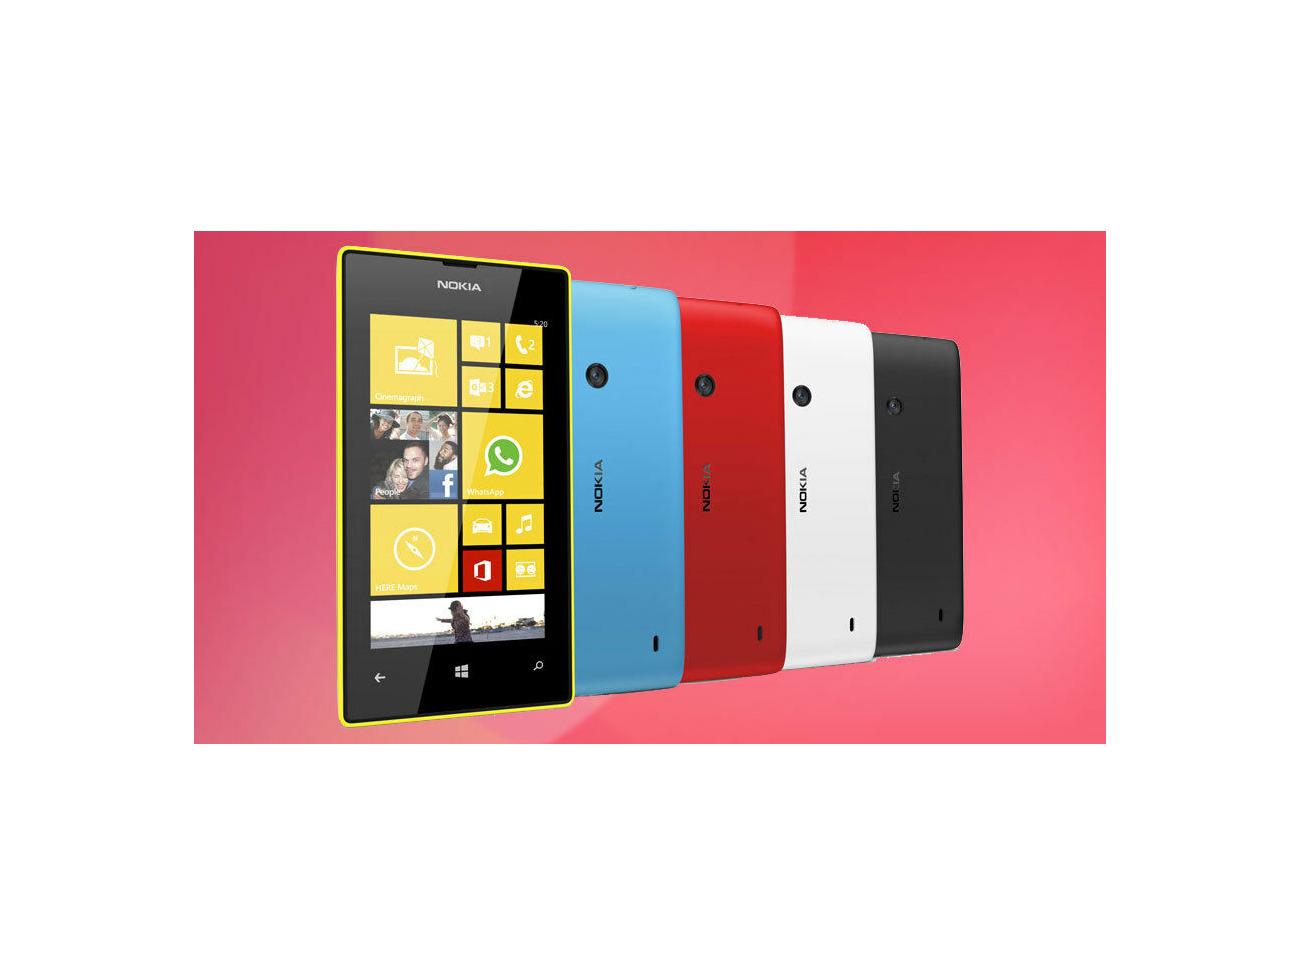 Buy Nokia Lumia 520 - 8GB - unlock Smartphone | Fat Llama